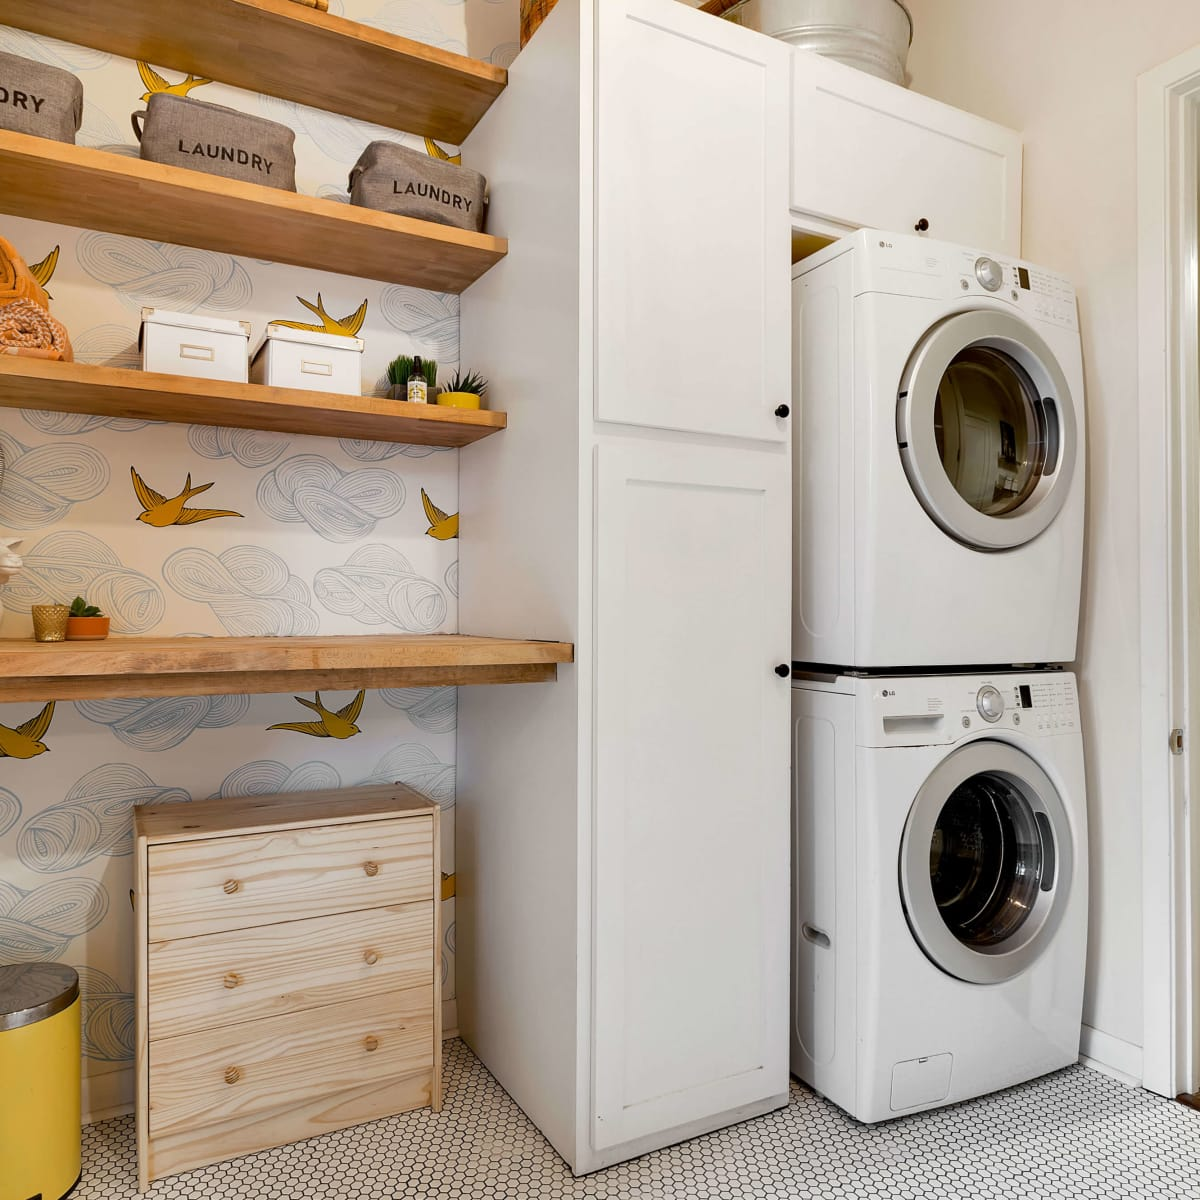 East Austin house home 1131 Poquito Street 78702 laundry bathroom